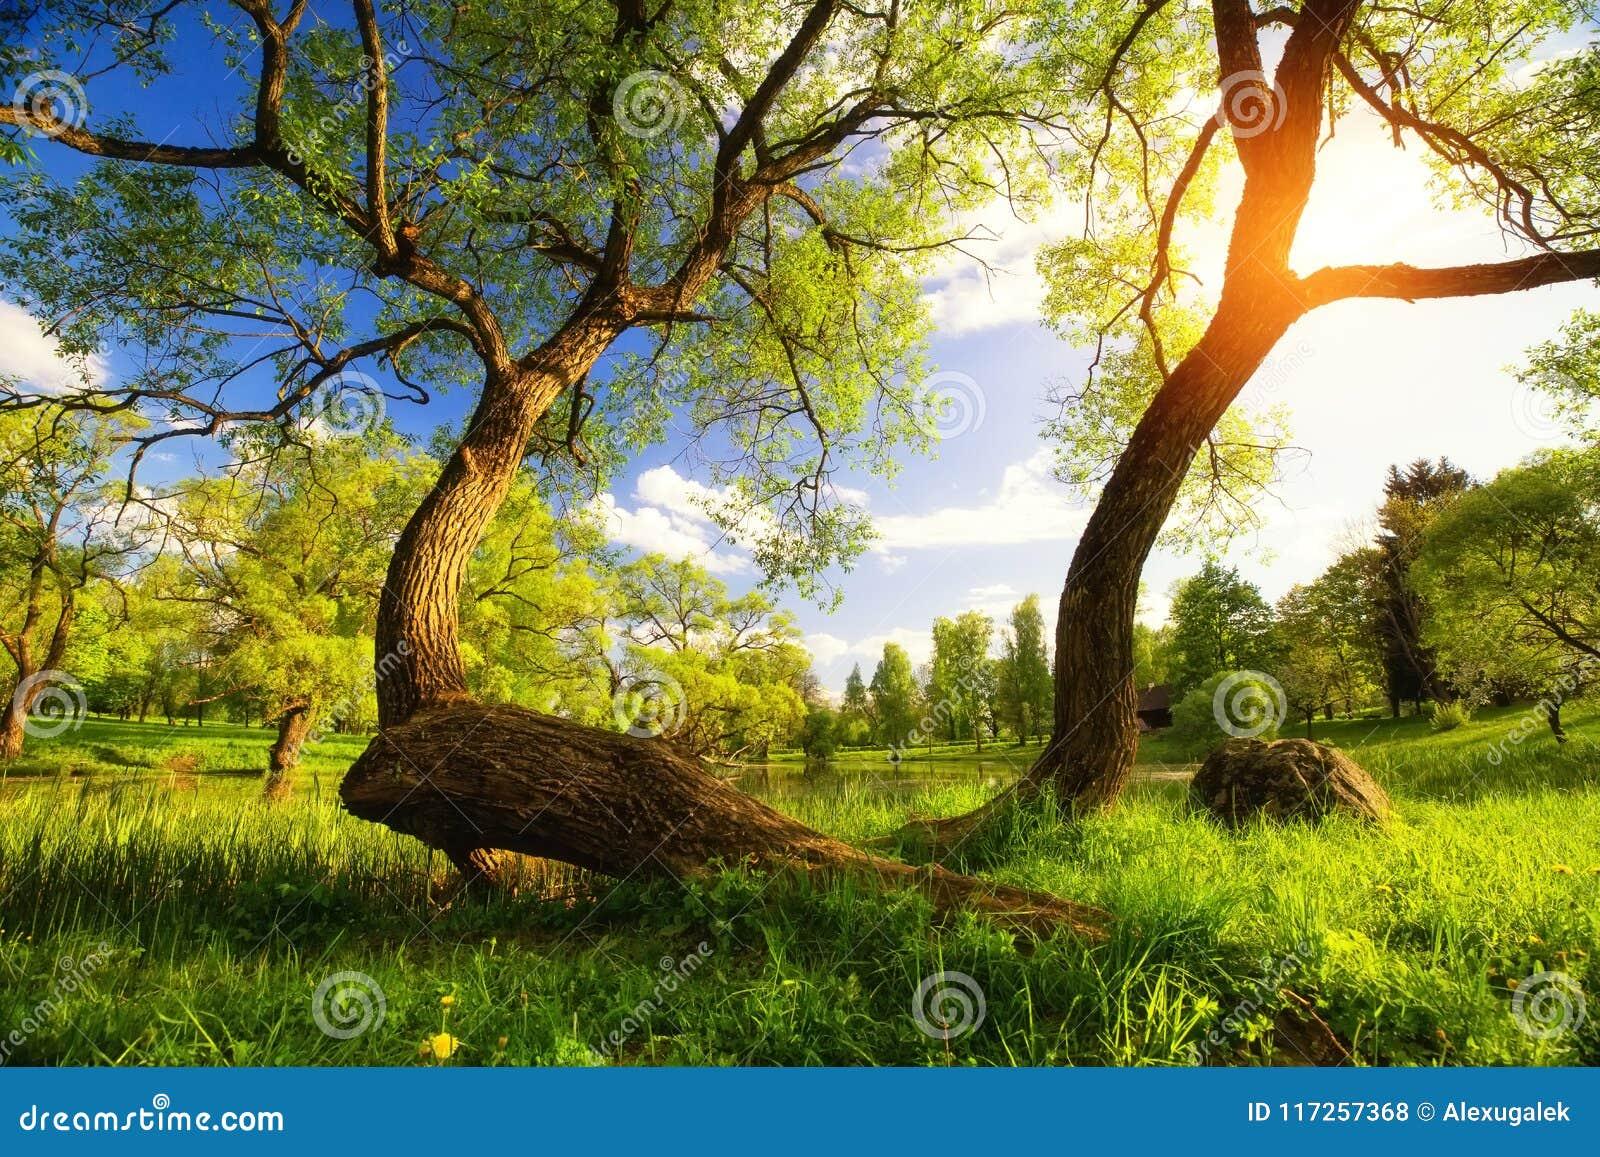 Summer vibrant landscape